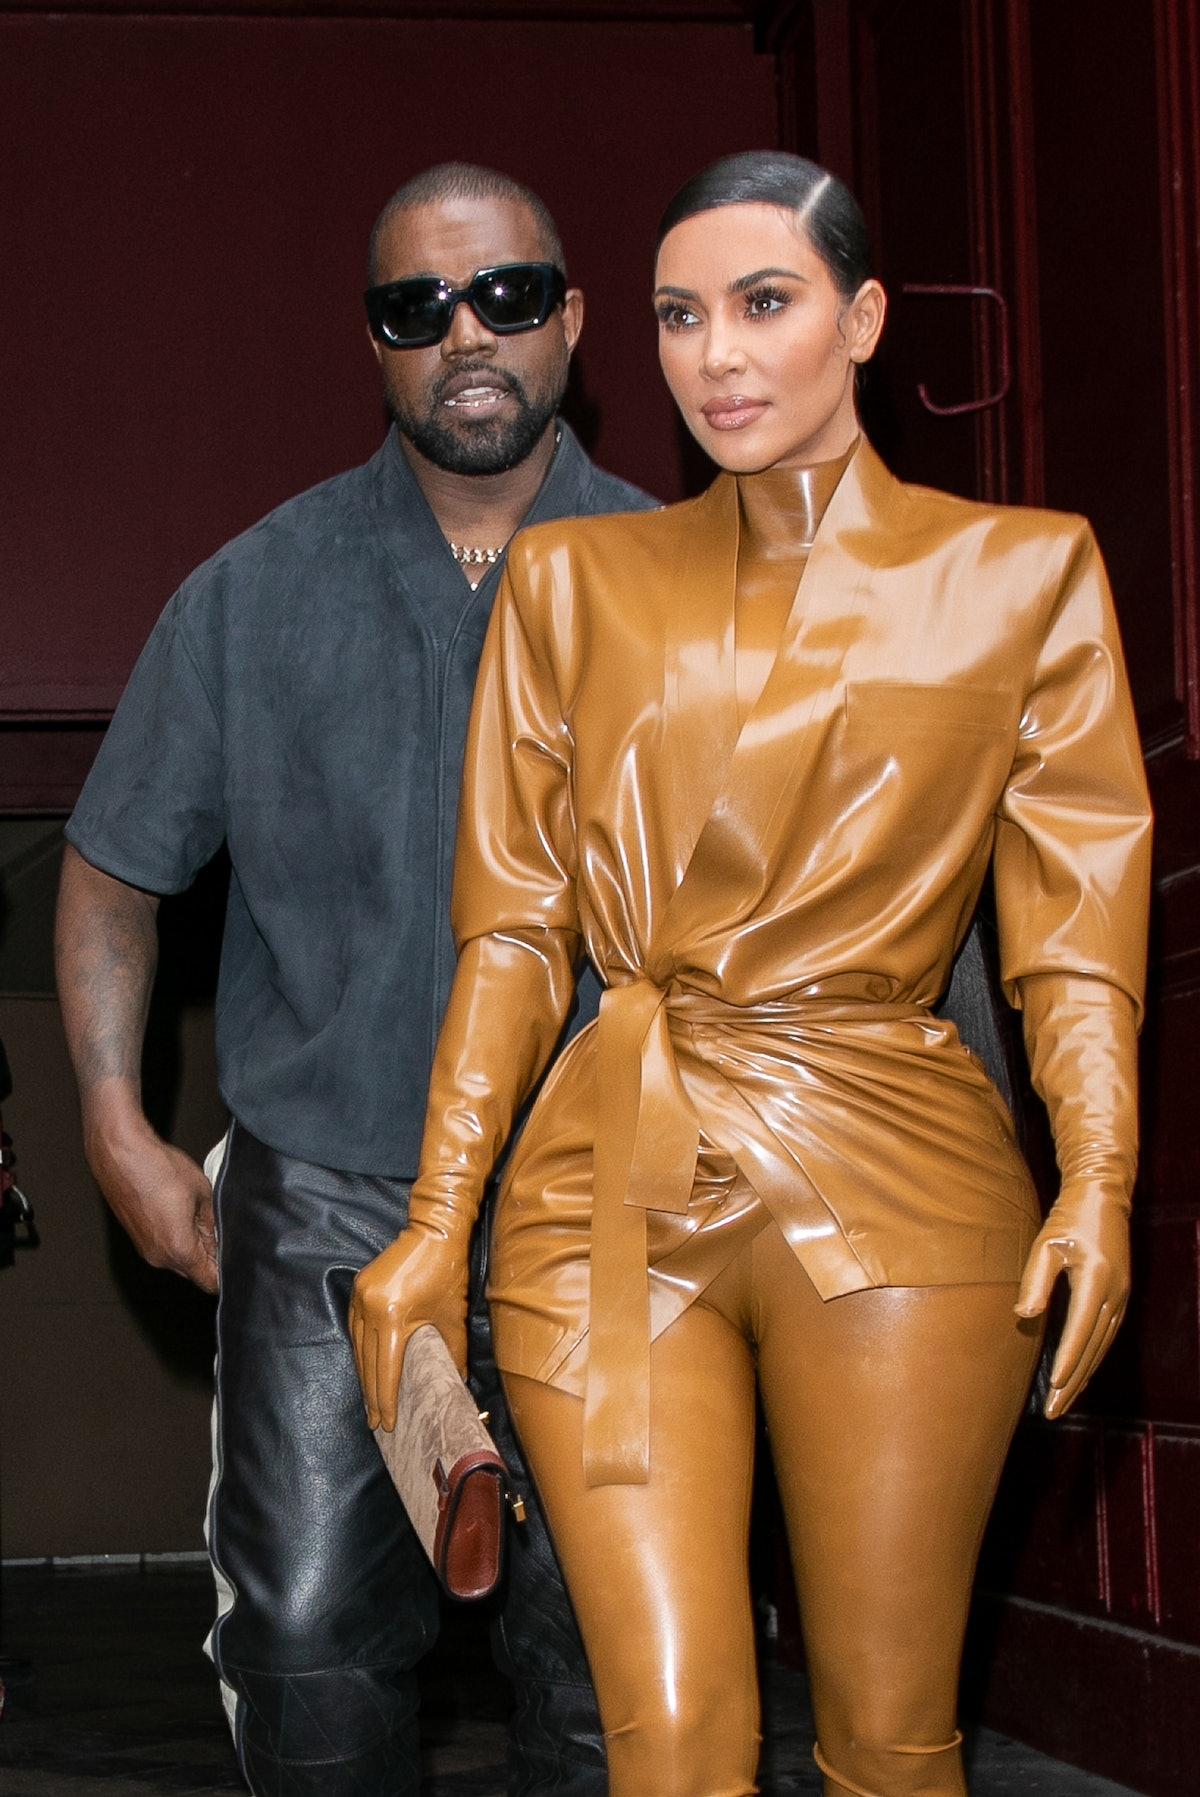 PARIS, FRANCE - MARCH 01: Kim Kardashian West and husband Kanye West leave K.West's Sunday Service A...